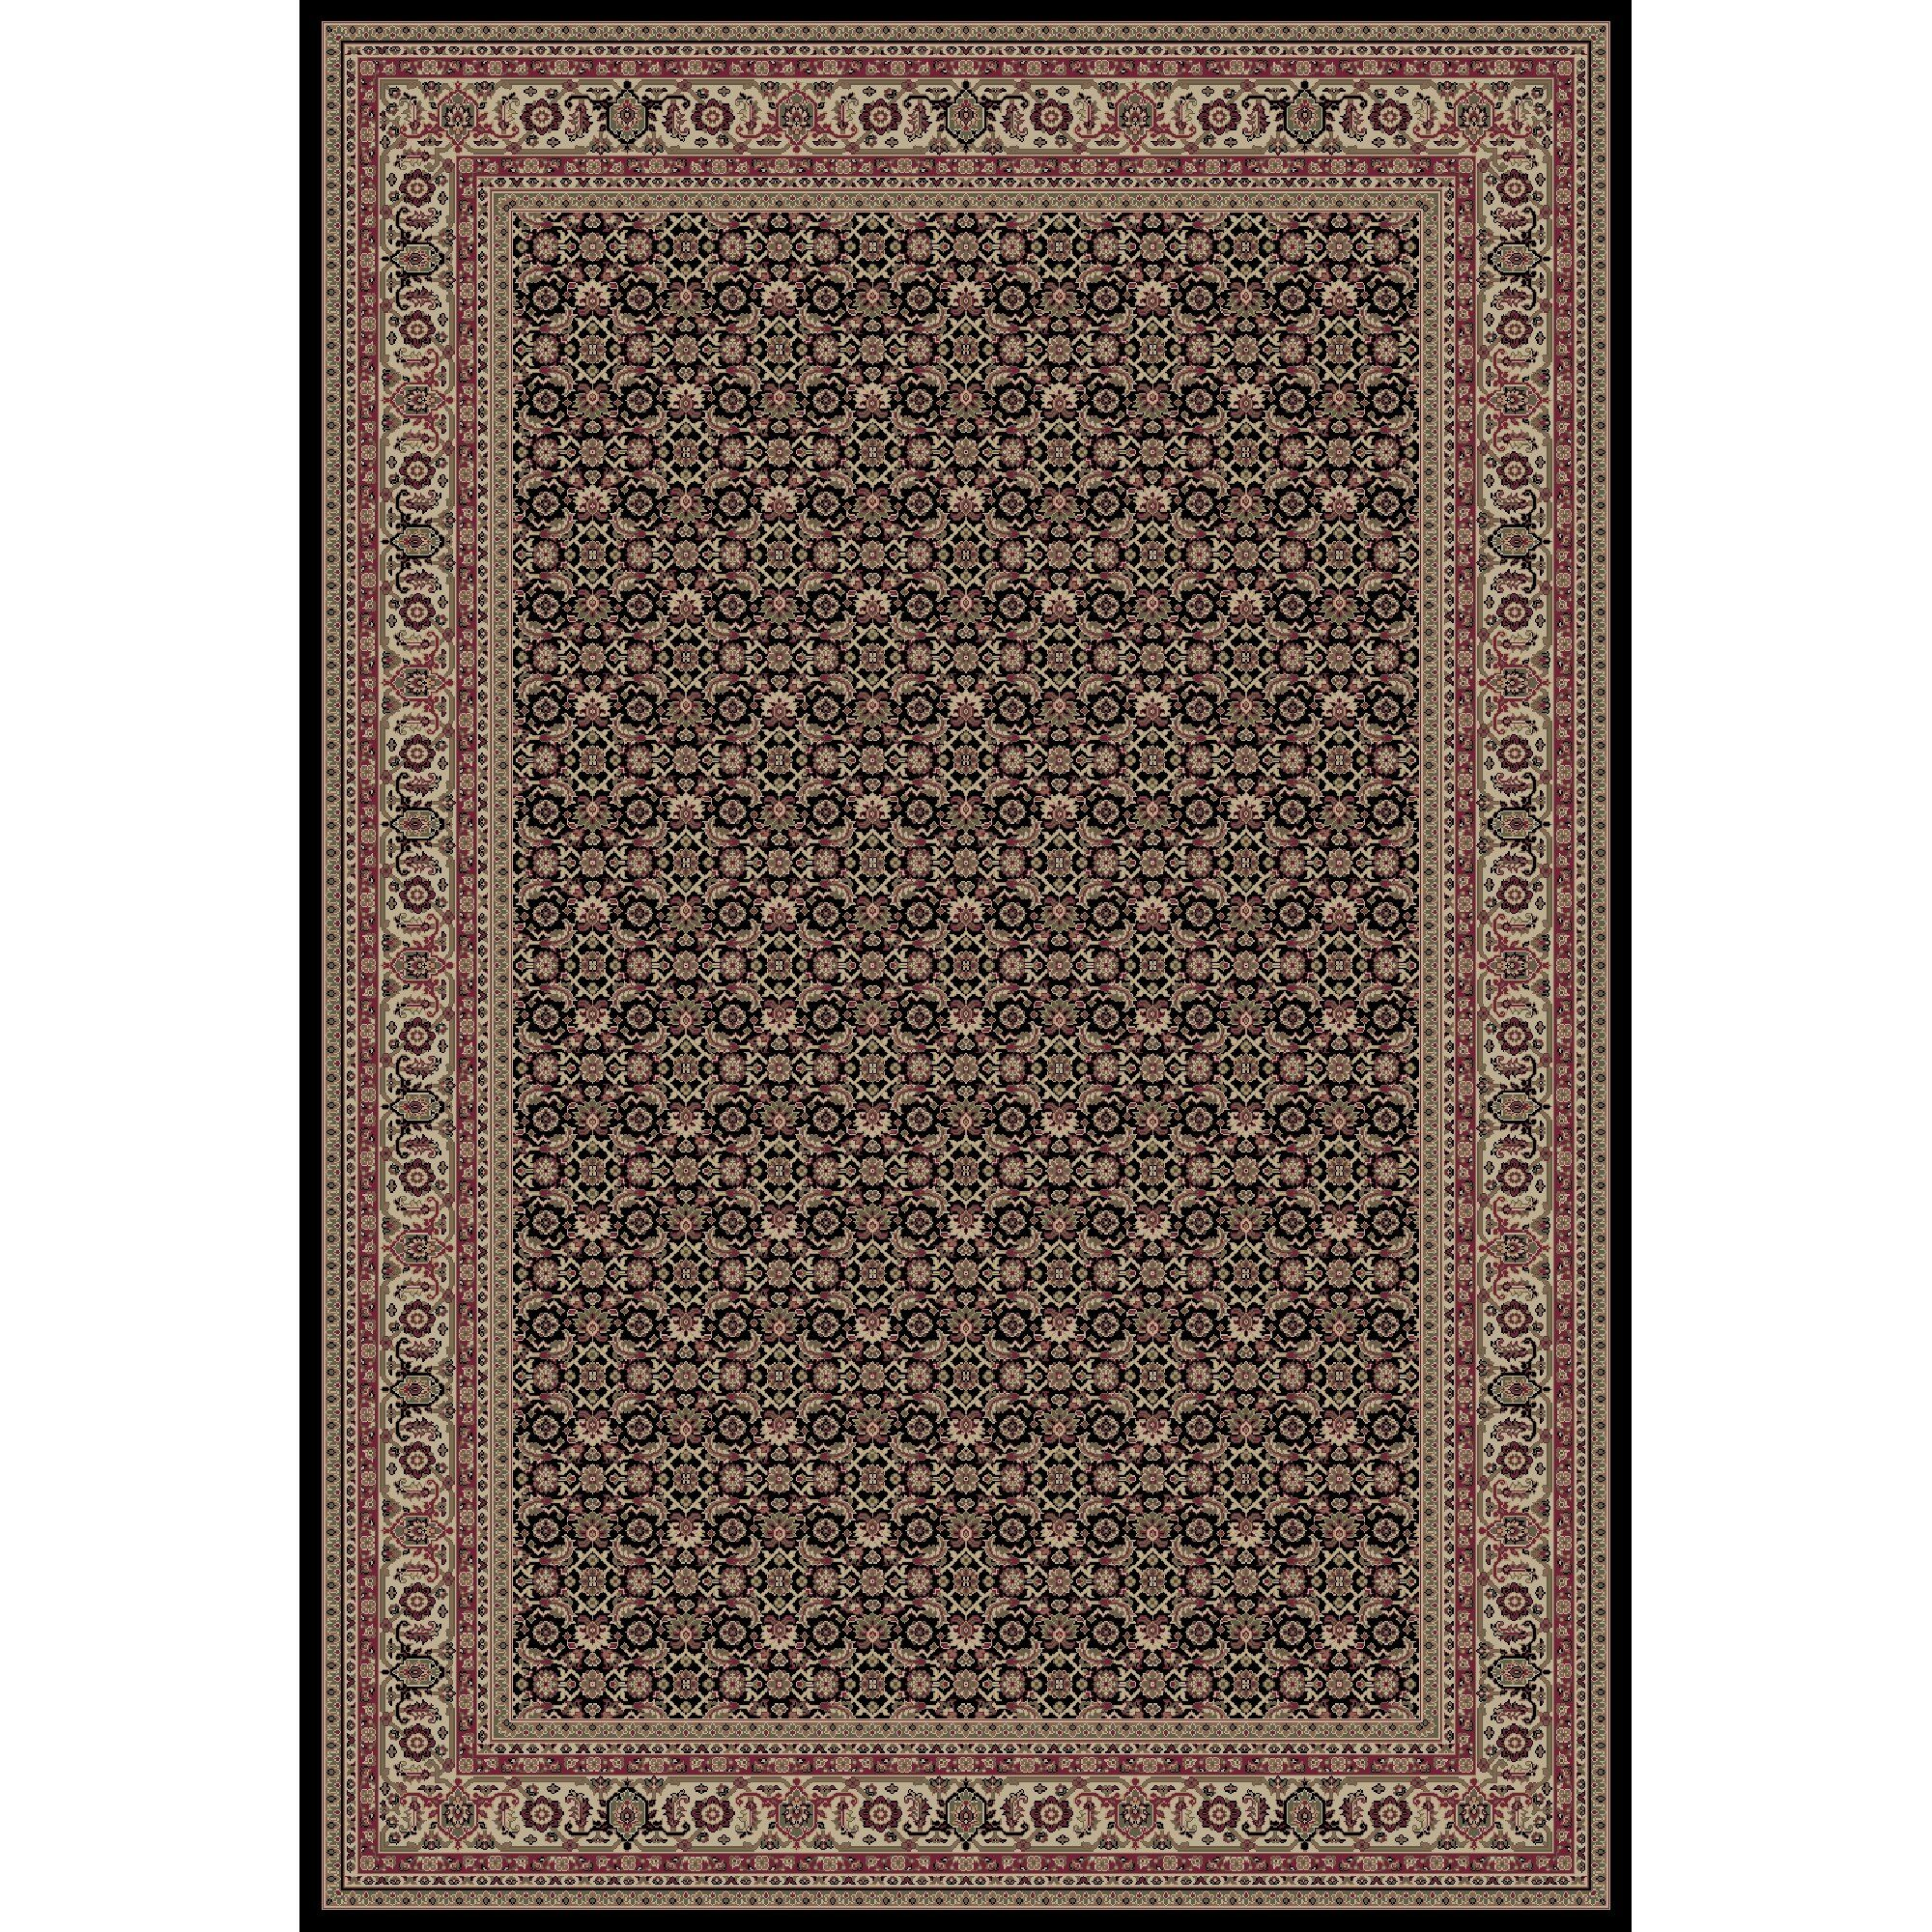 Persian Classics Oriental Herati Brown Area Rug Rug Size: 5'3